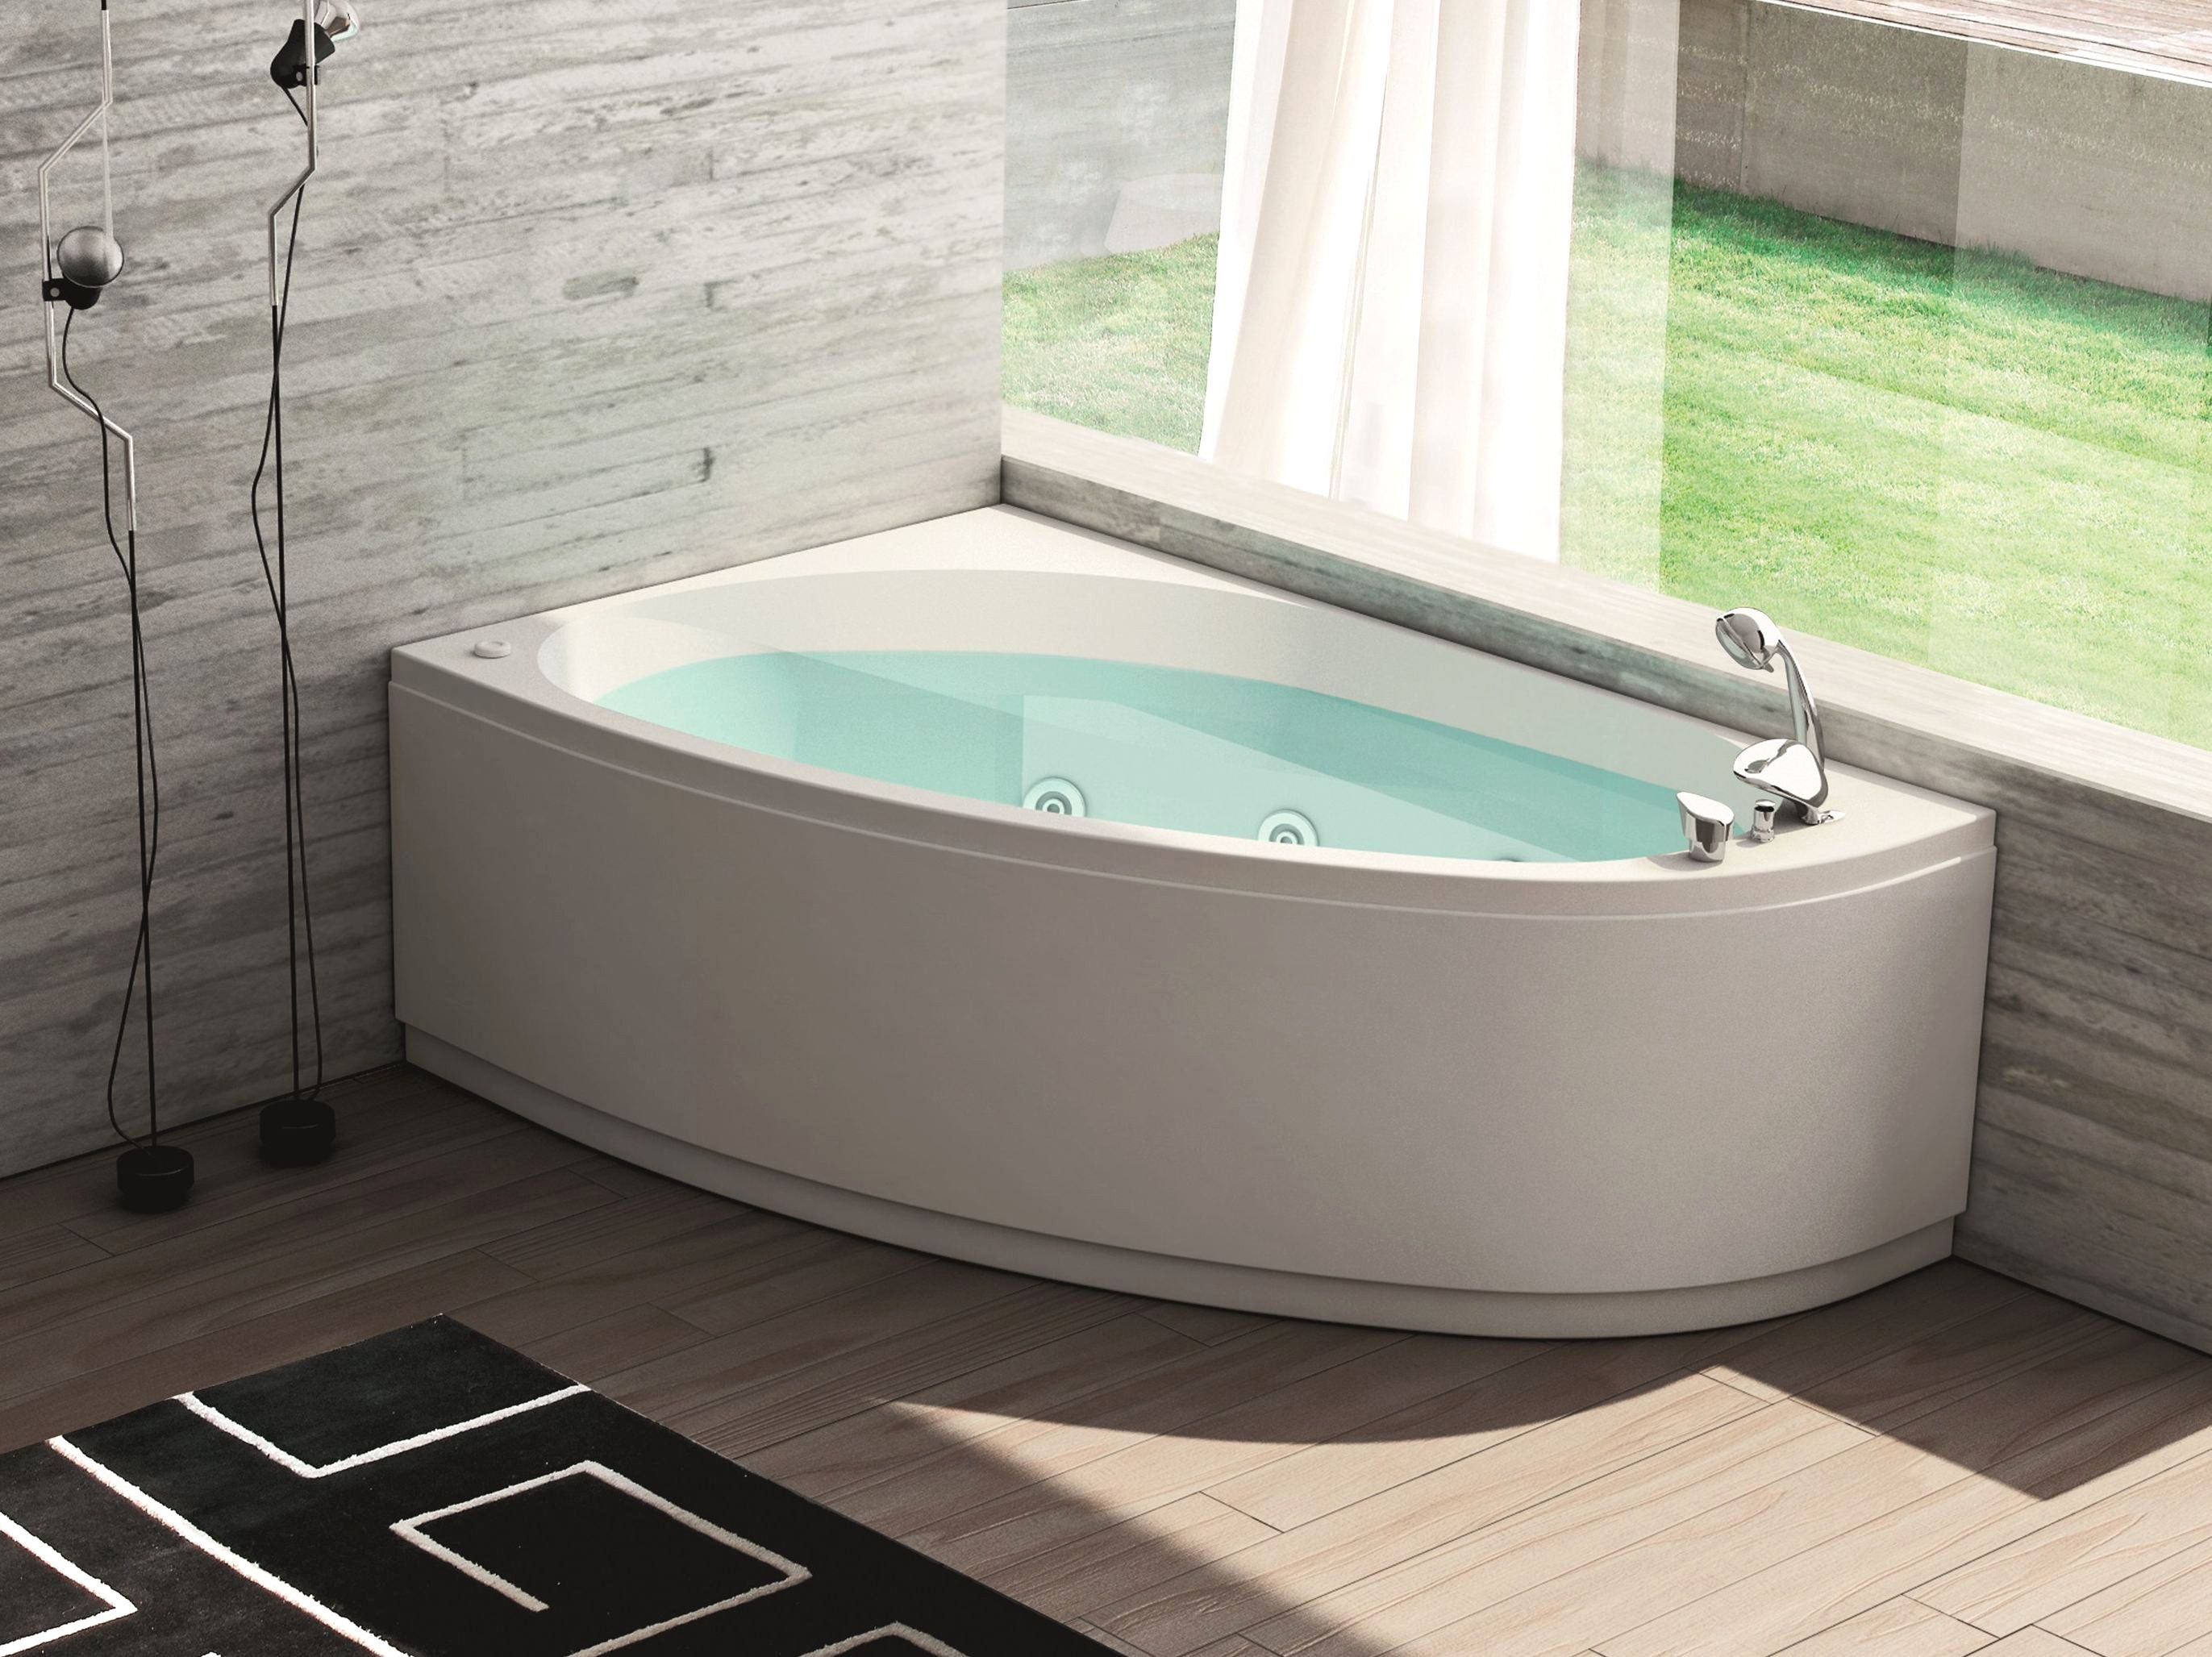 Awesome Salle De Bain Originale Et Pas Chere Corner Bathtub Whirlpool Bathtub Whirlpool Tub